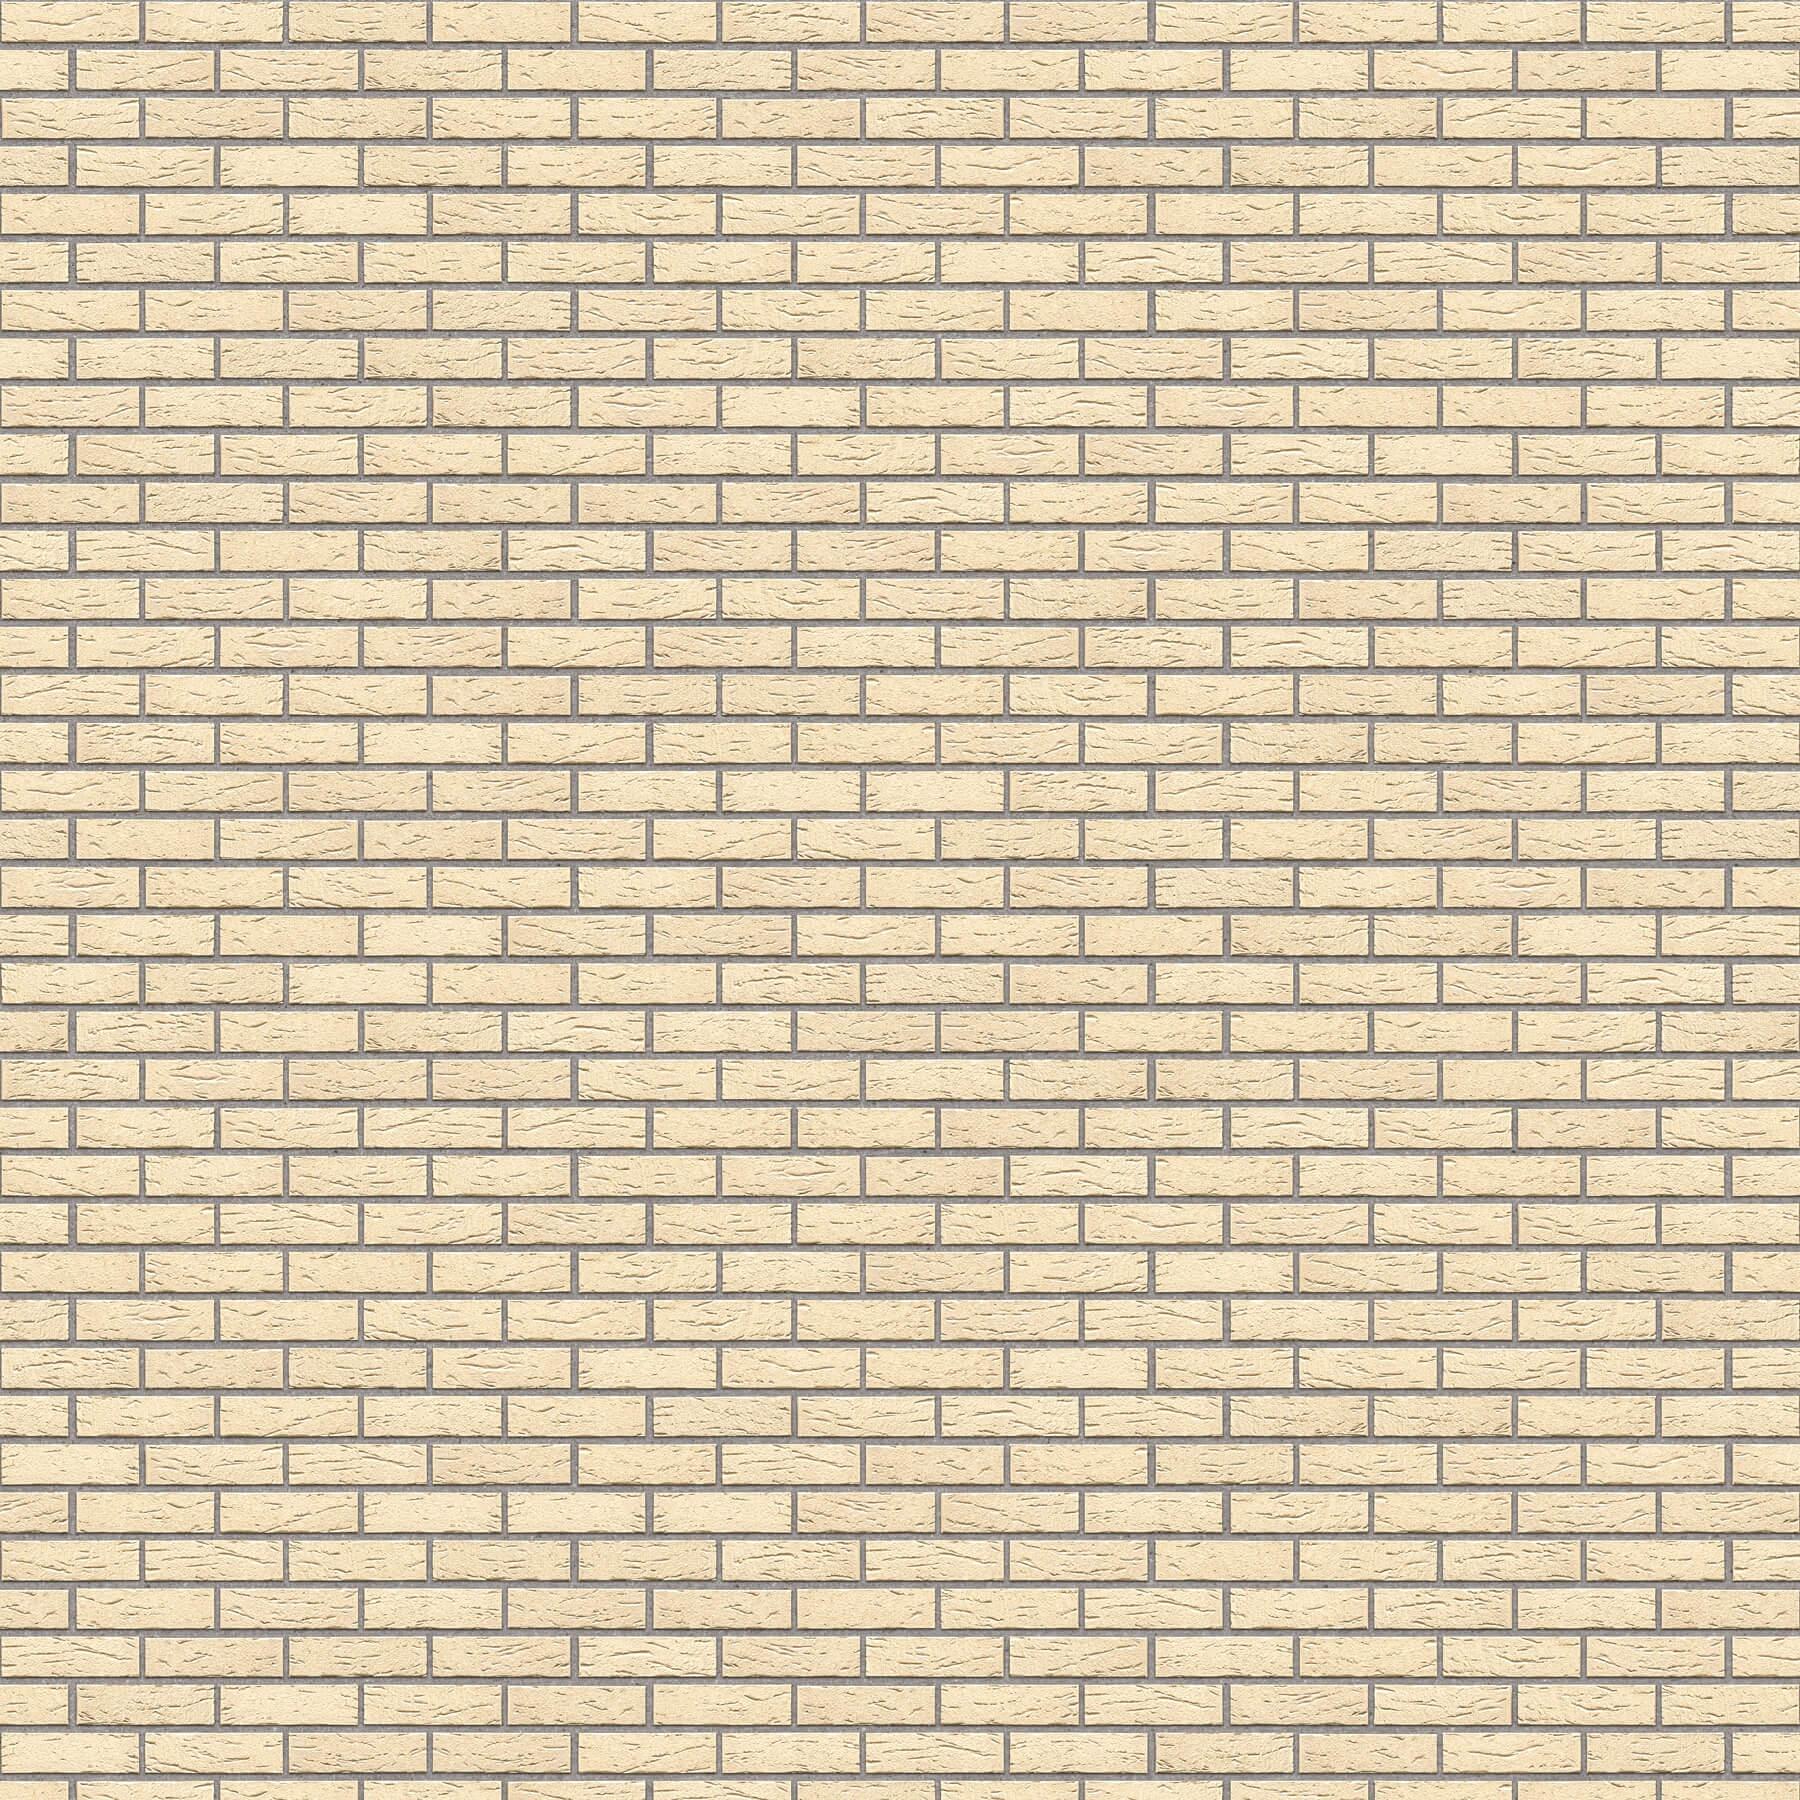 Dekorativna cigla listela FeldHaus Klinker r-691 nf Siva Fuga